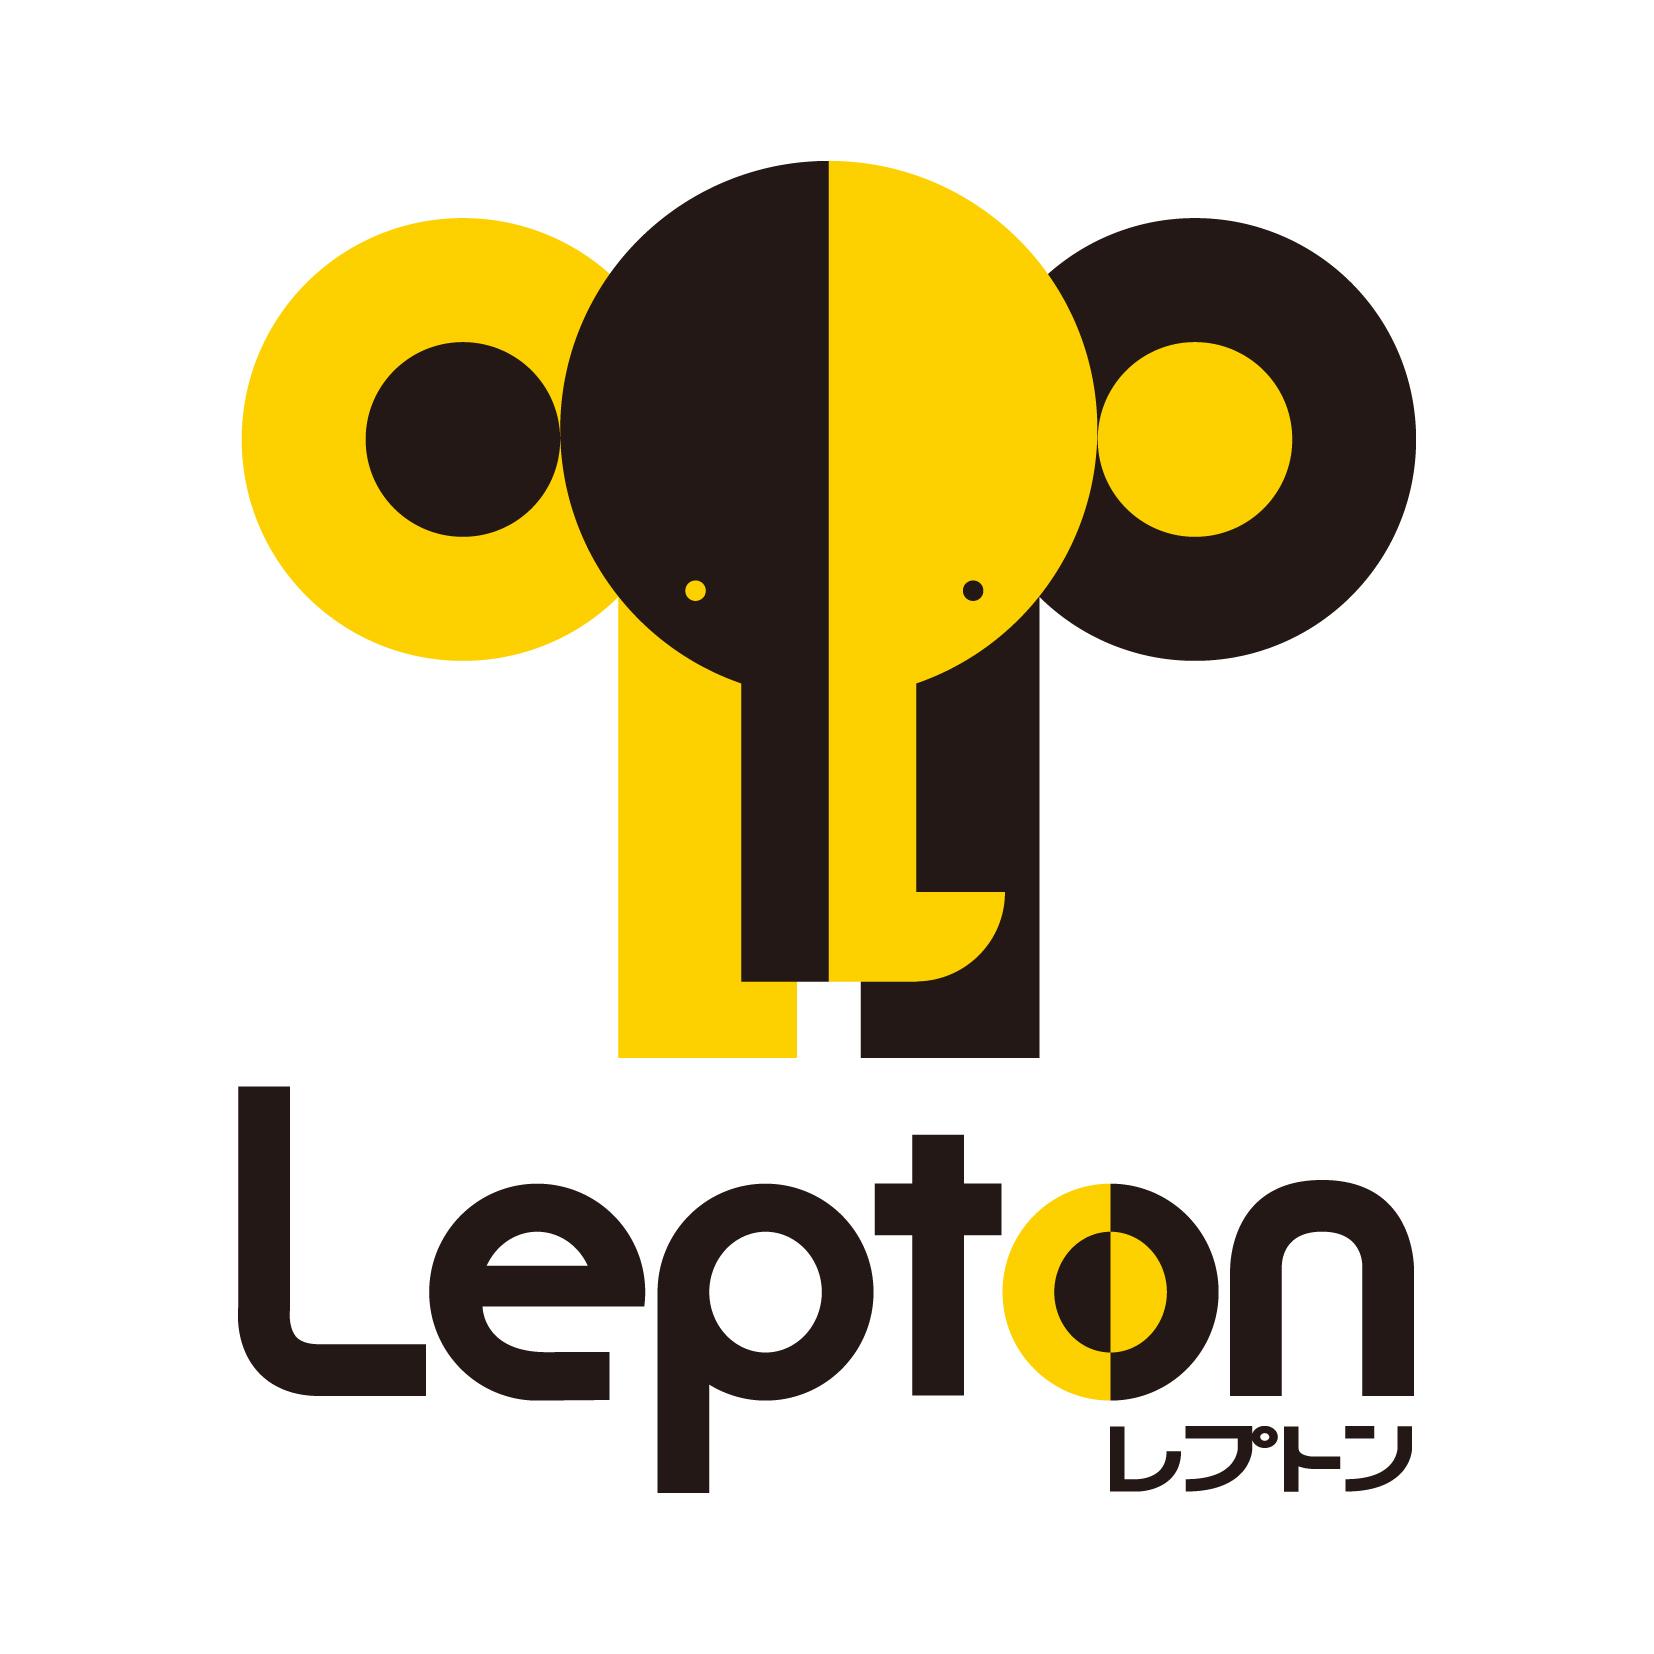 Leptonで身につく4つの技能